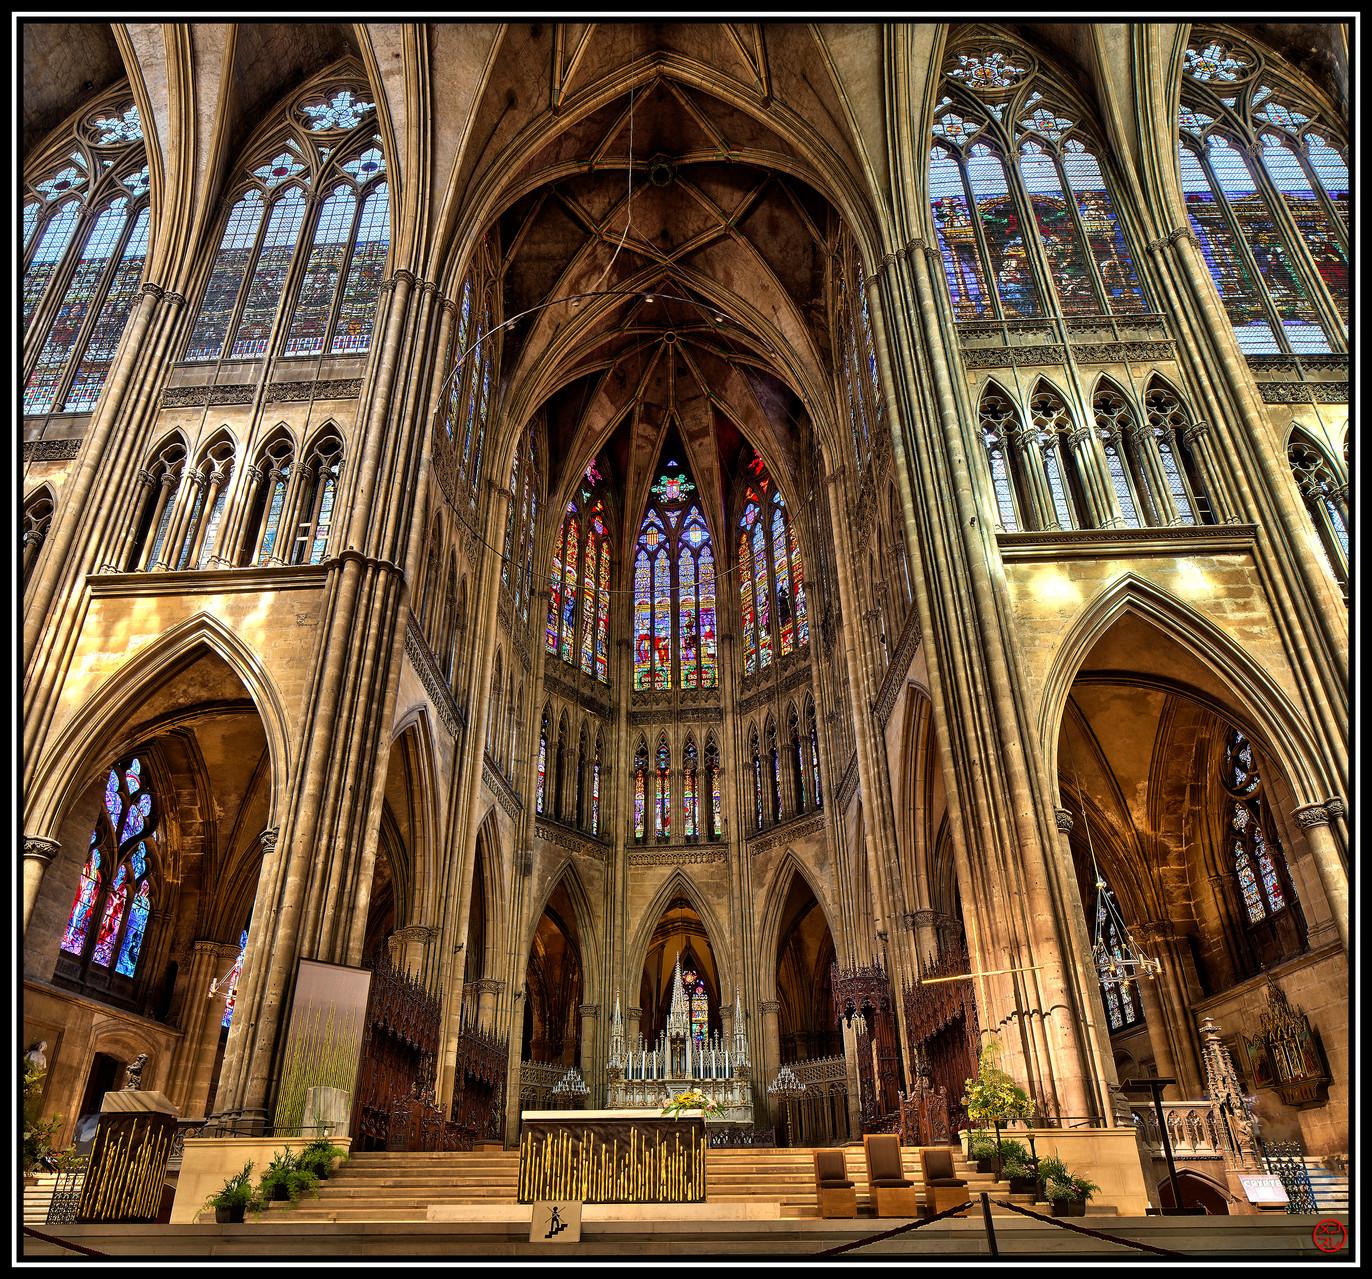 Cathédrale de Metz, France (2012)